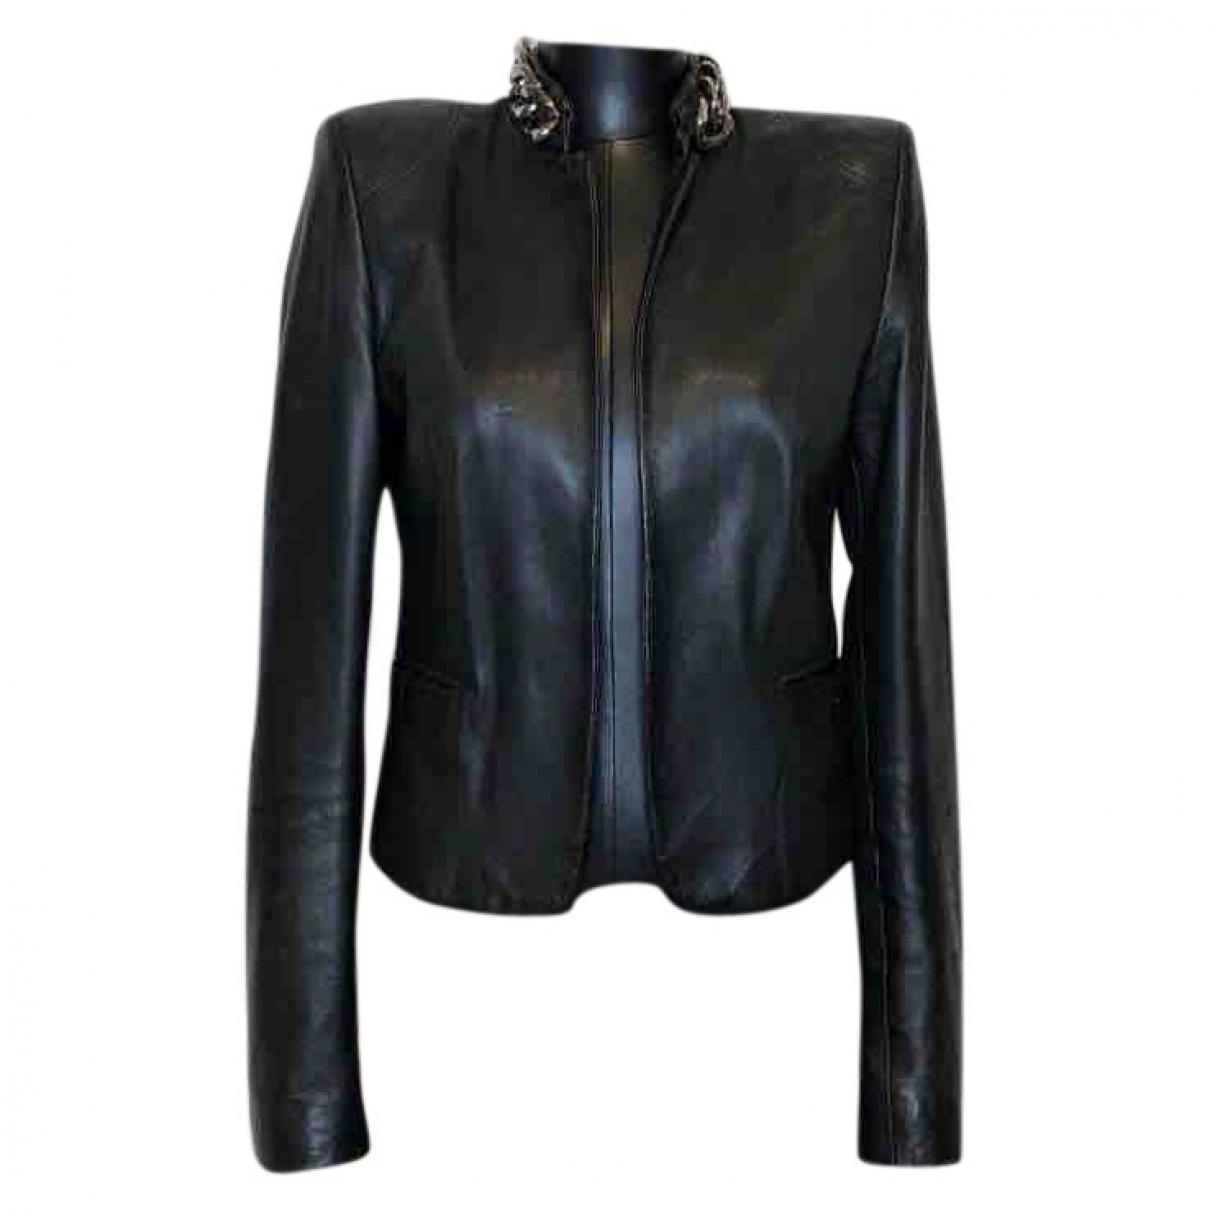 Philipp Plein \N Black Leather jacket for Women S International